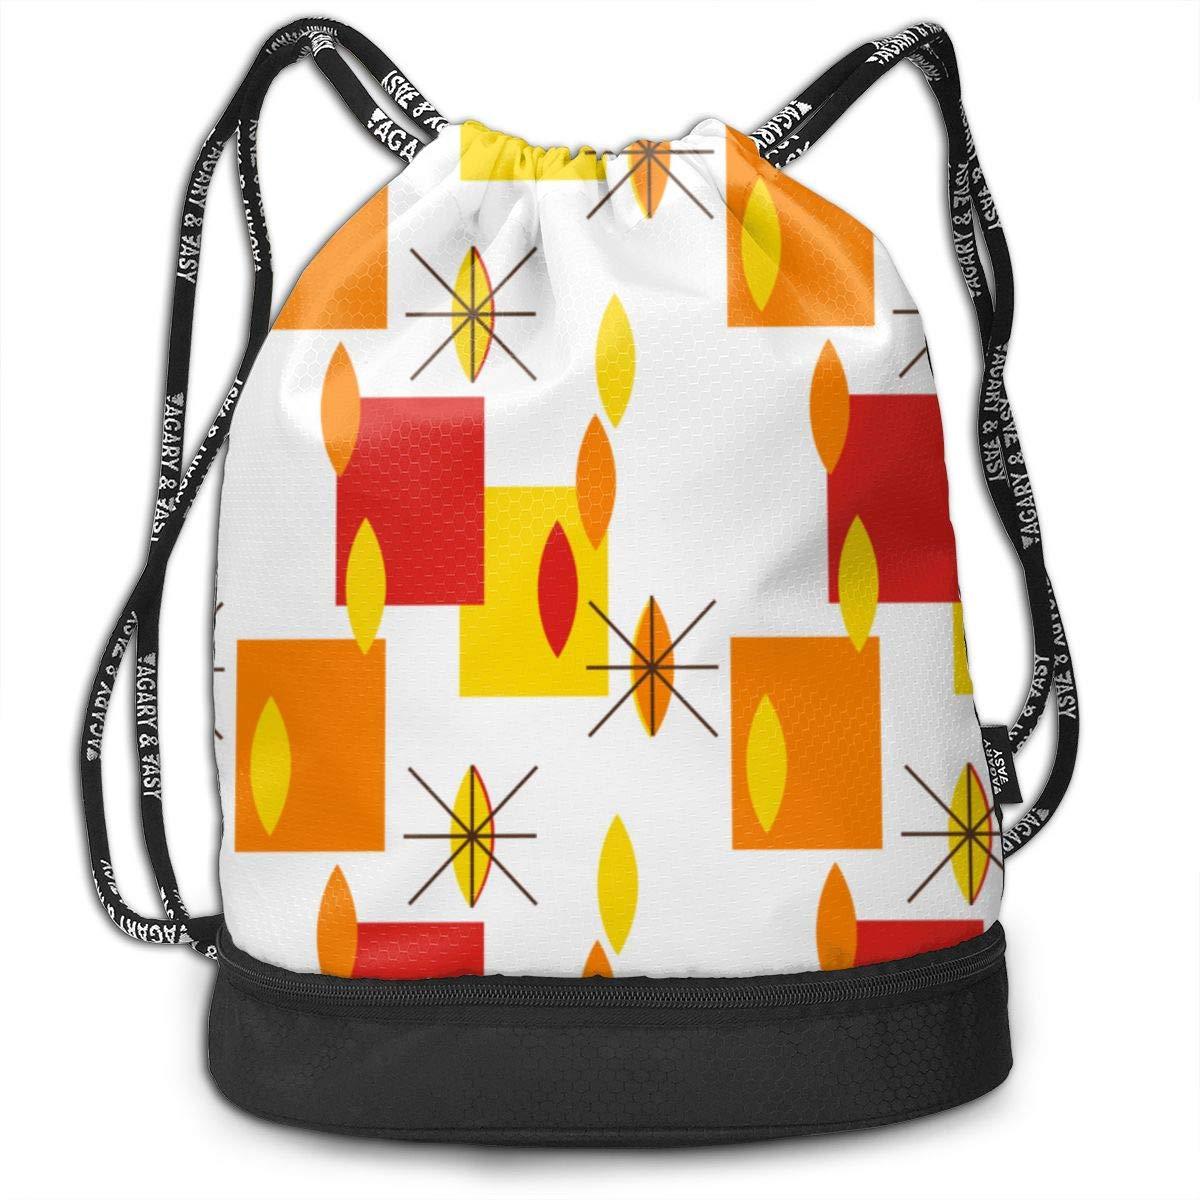 Summer Rain Drawstring Backpack Sports Athletic Gym Cinch Sack String Storage Bags for Hiking Travel Beach